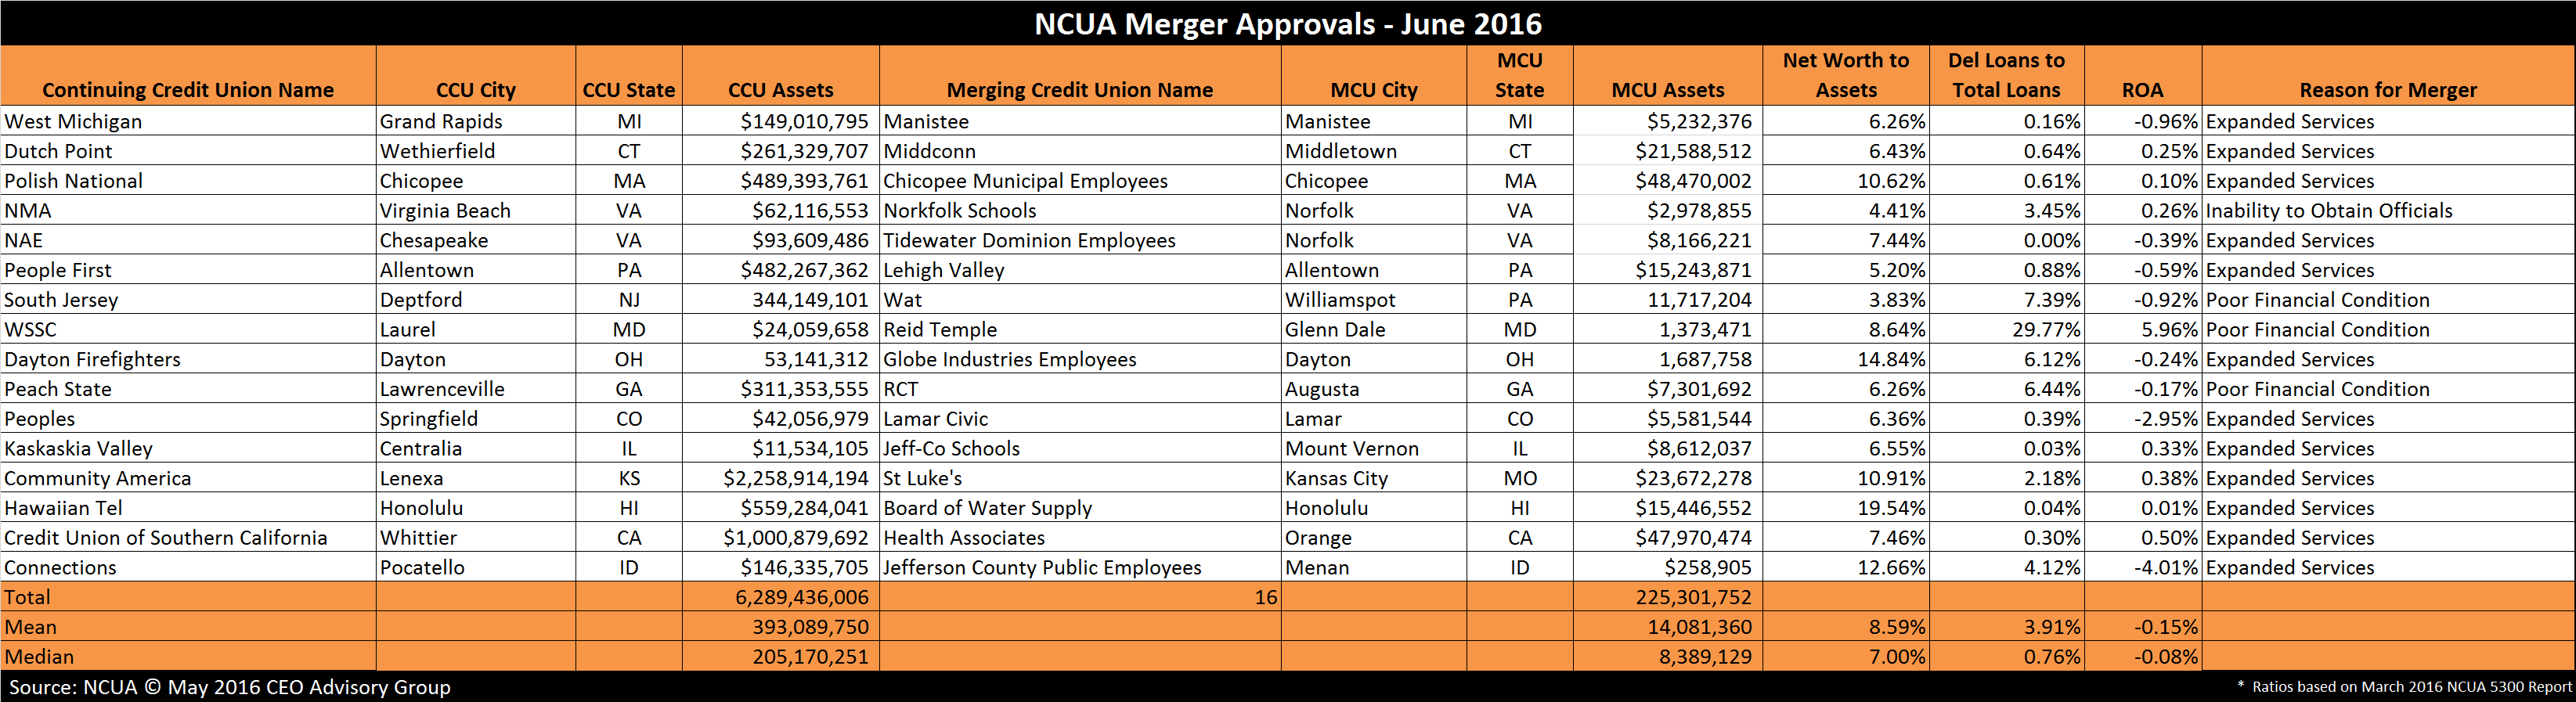 Credit Union Mergers June 2016